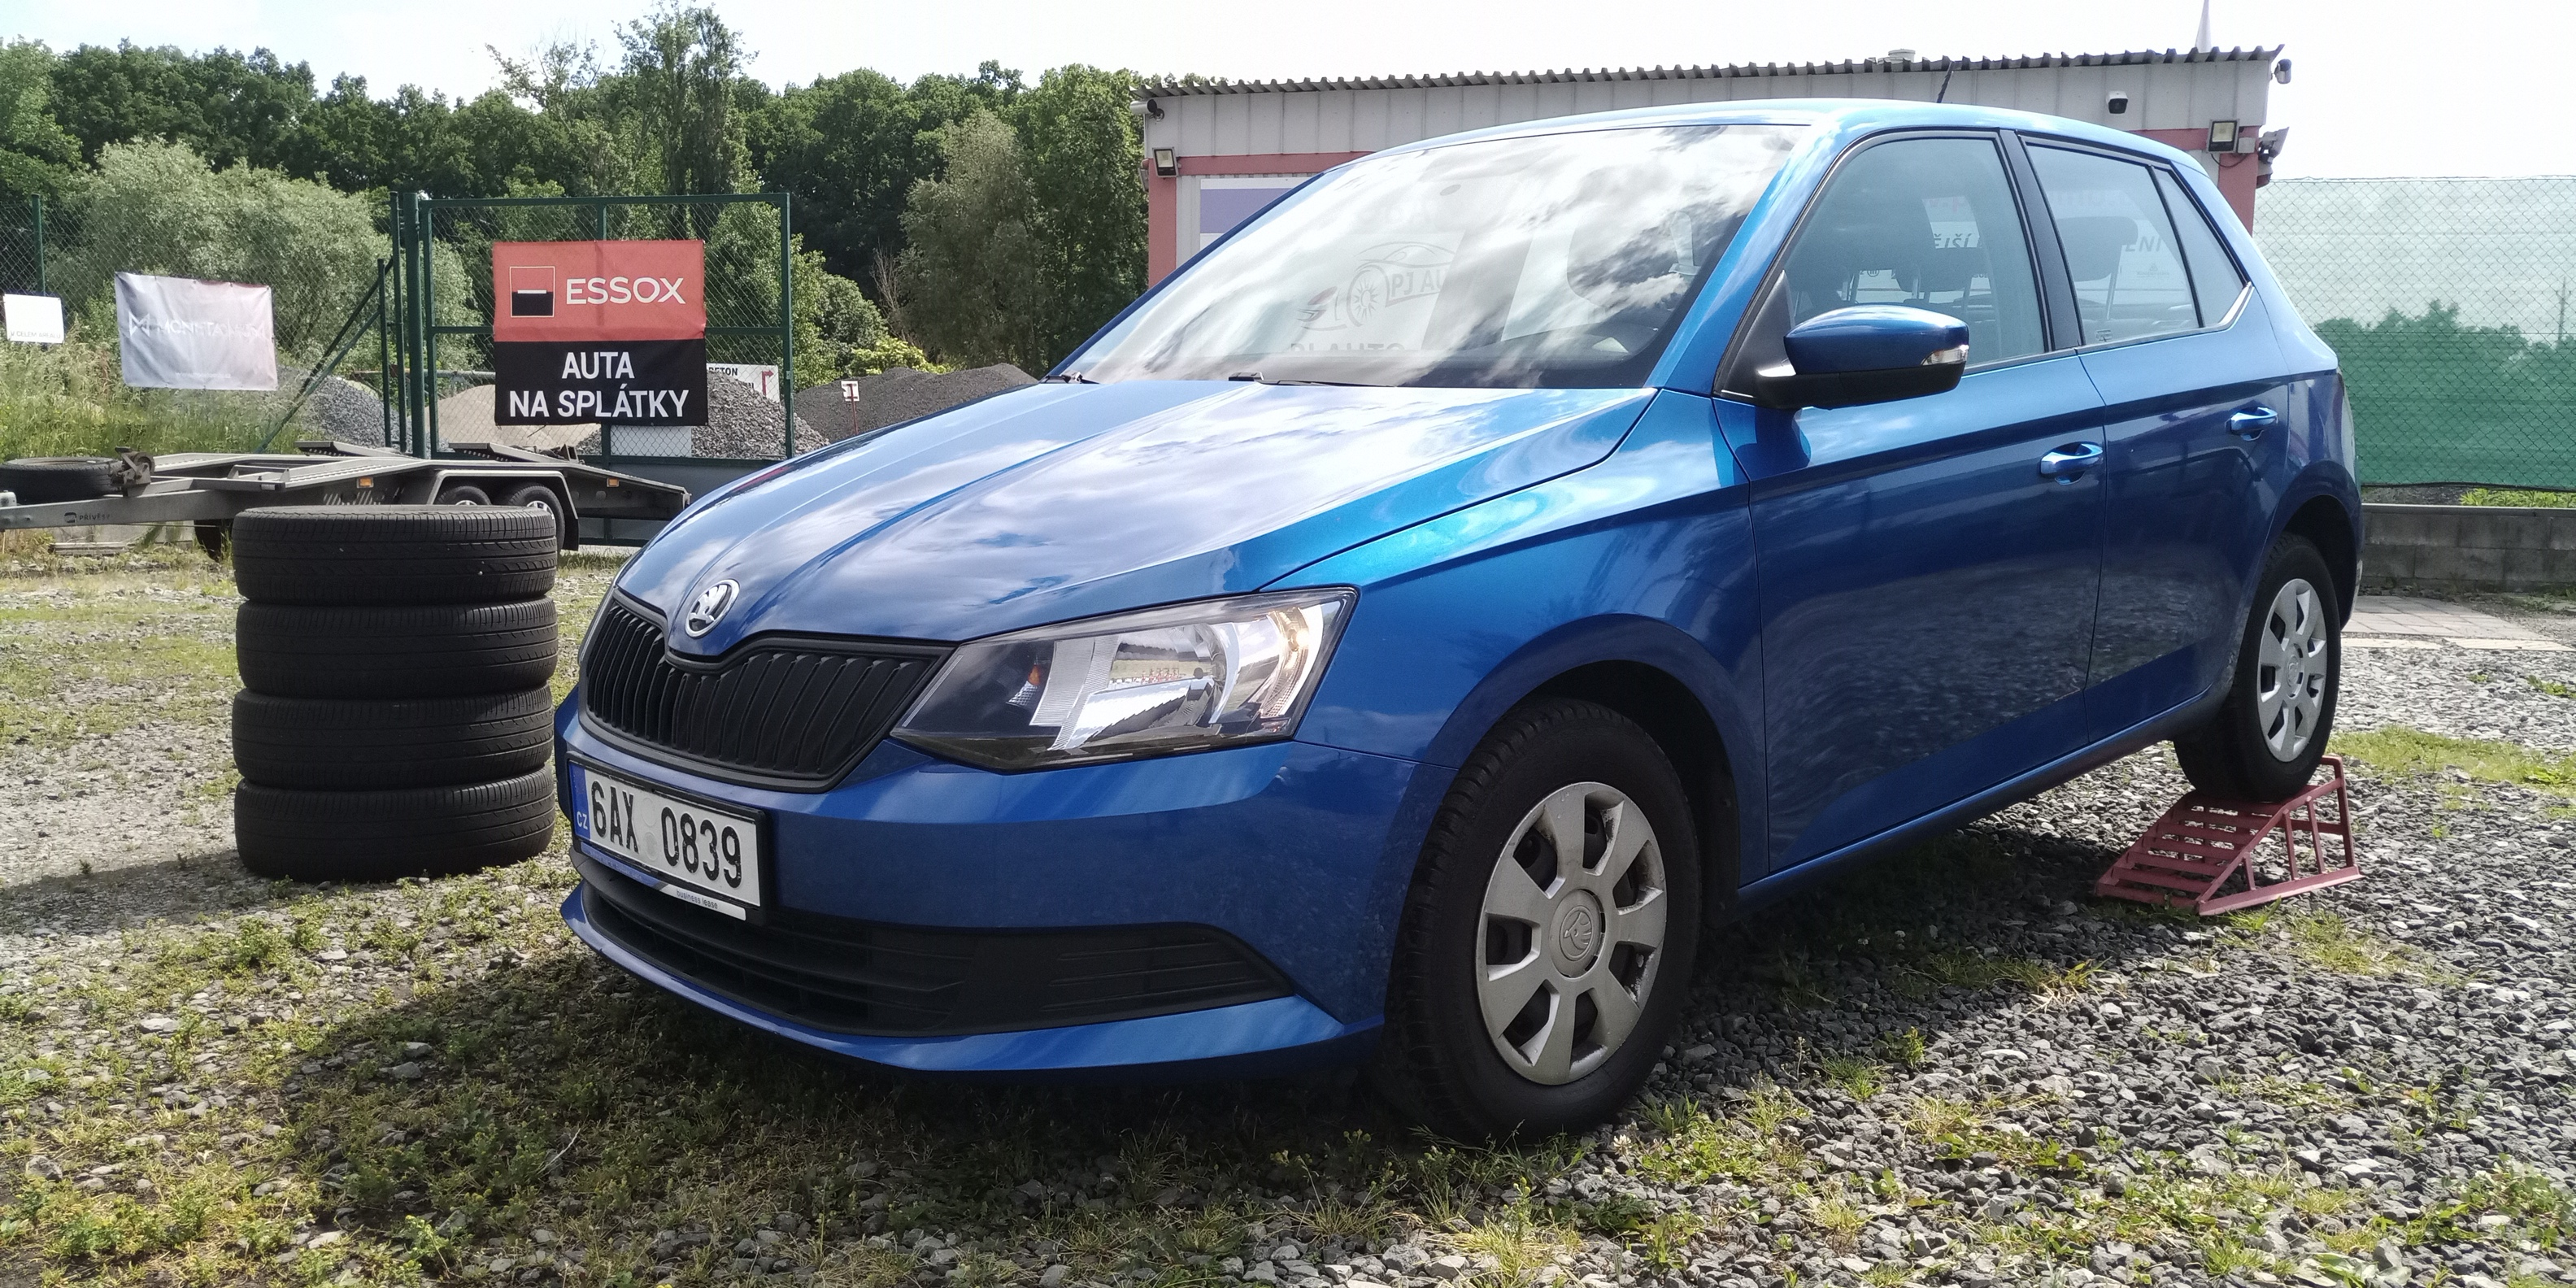 Škoda Fabia 1.0 TSi 70kW Active,Klima,1majitel ČR,DPH,2018